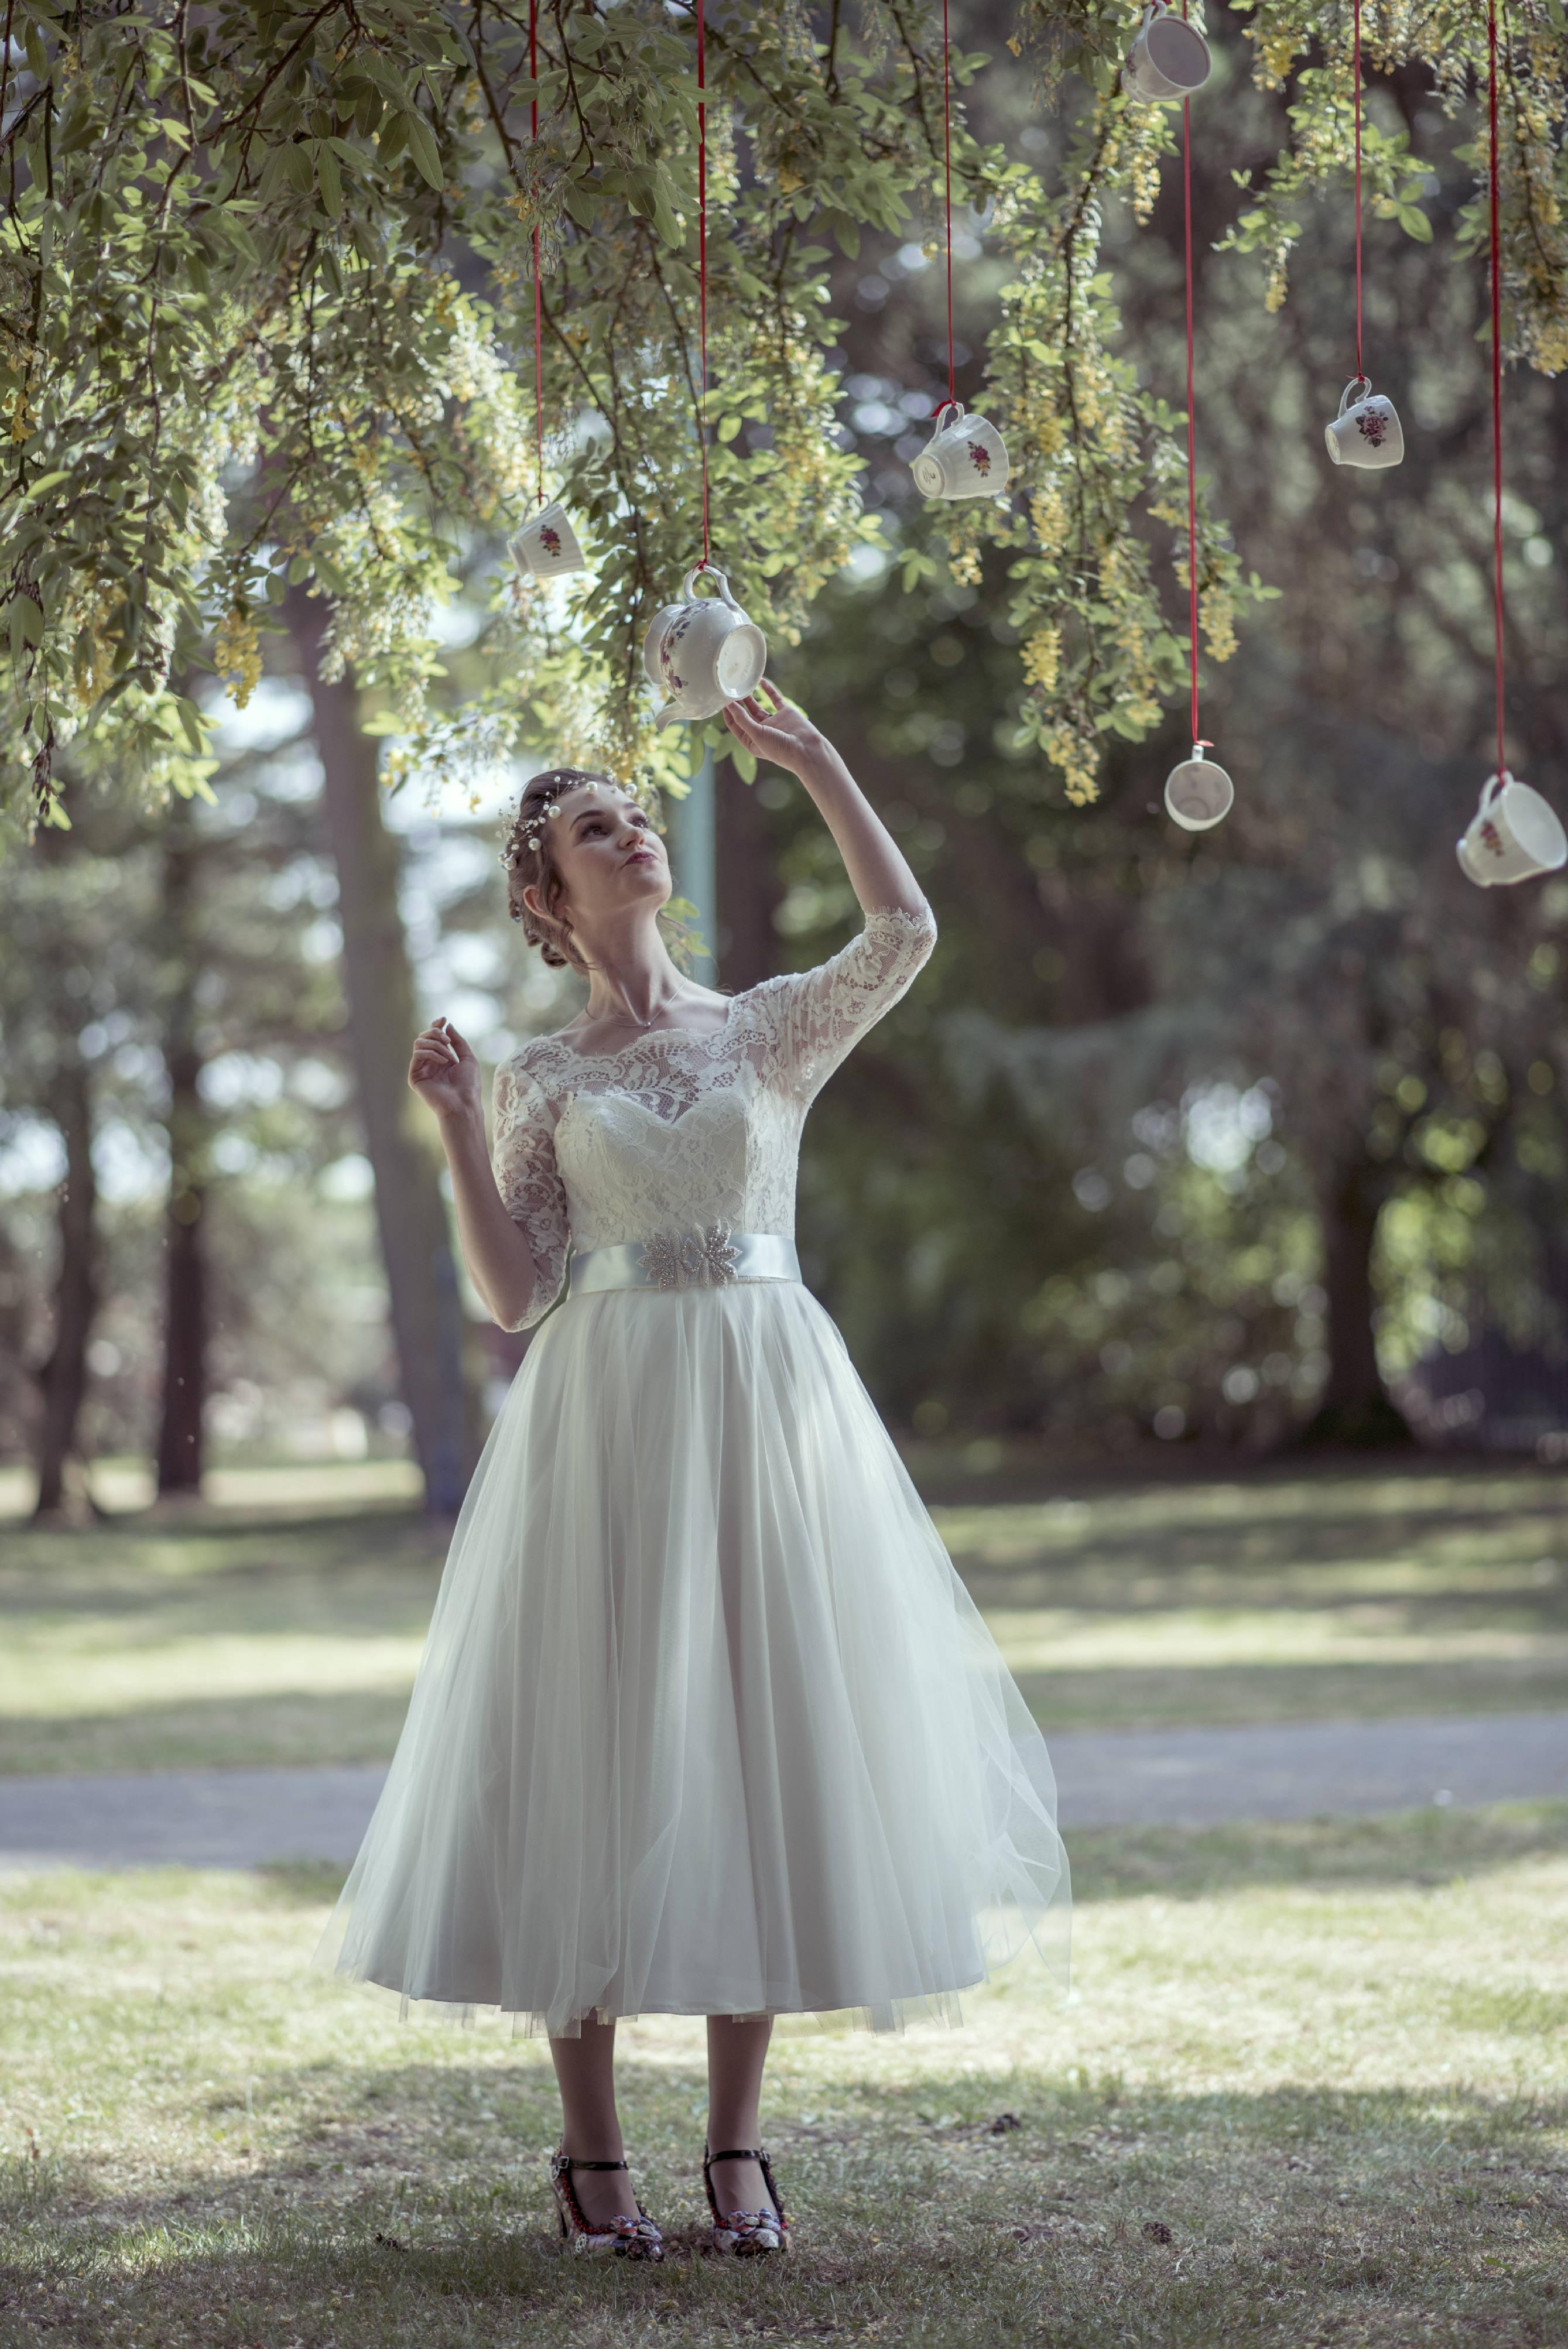 'Vintage meets Alice in Wonderland wedding' - A Mad Hatters Tea Party